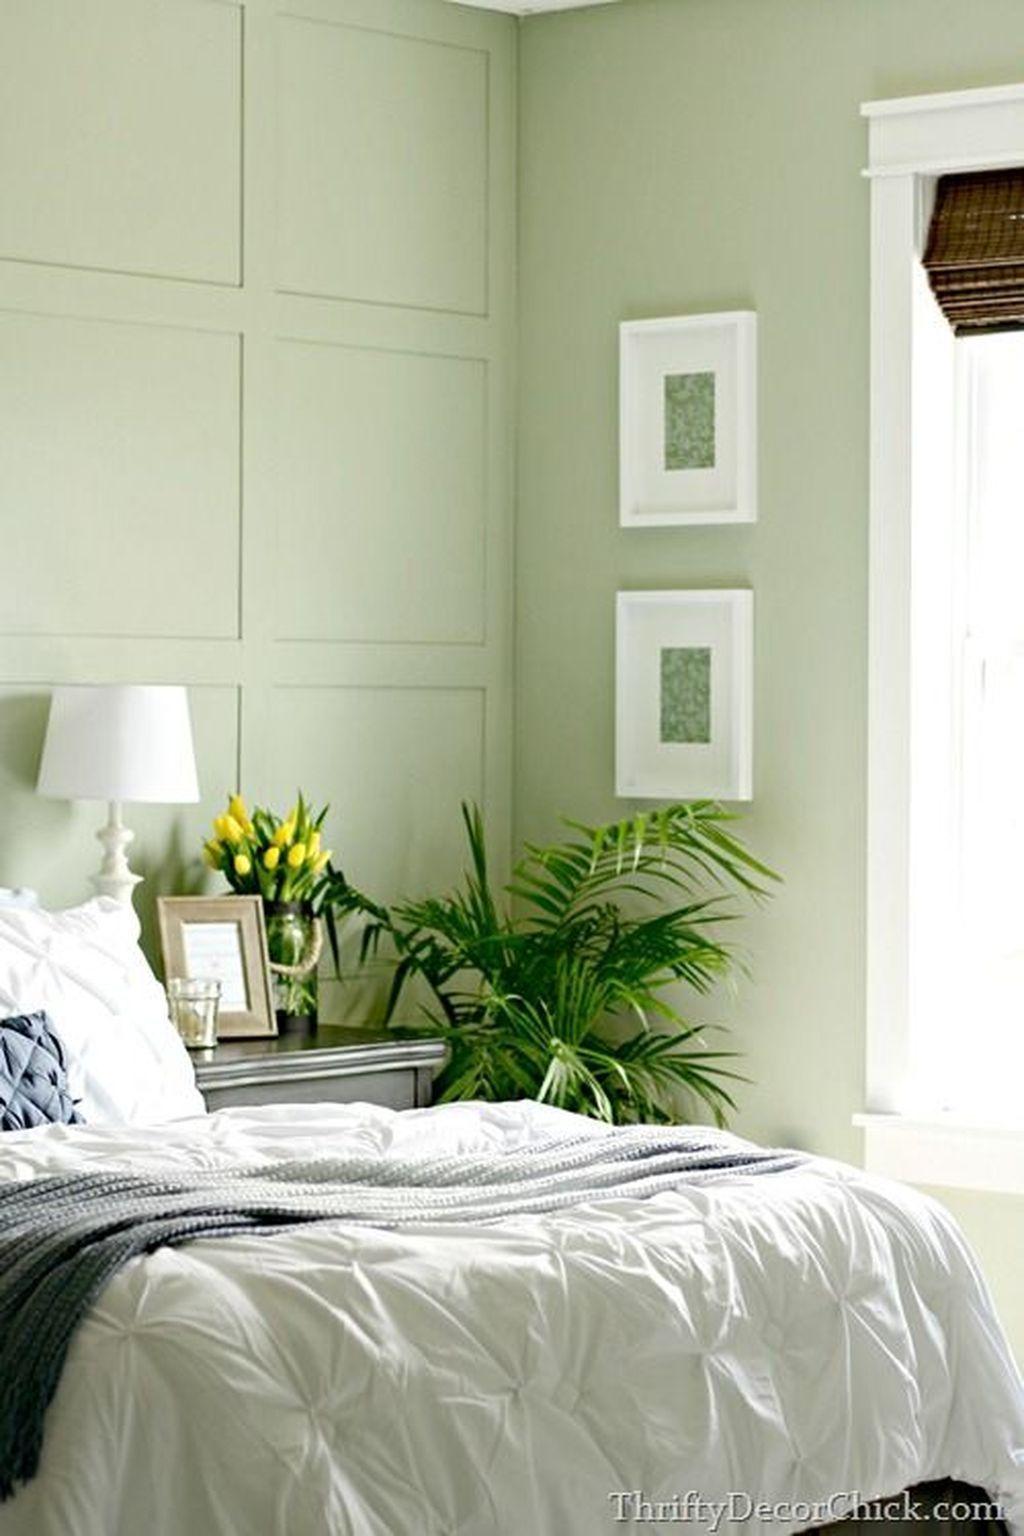 Amazing Bedroom Design Ideas Simple Modern Minimalist Green And White Bedroom Green Bedroom Walls Mint Green Bedroom